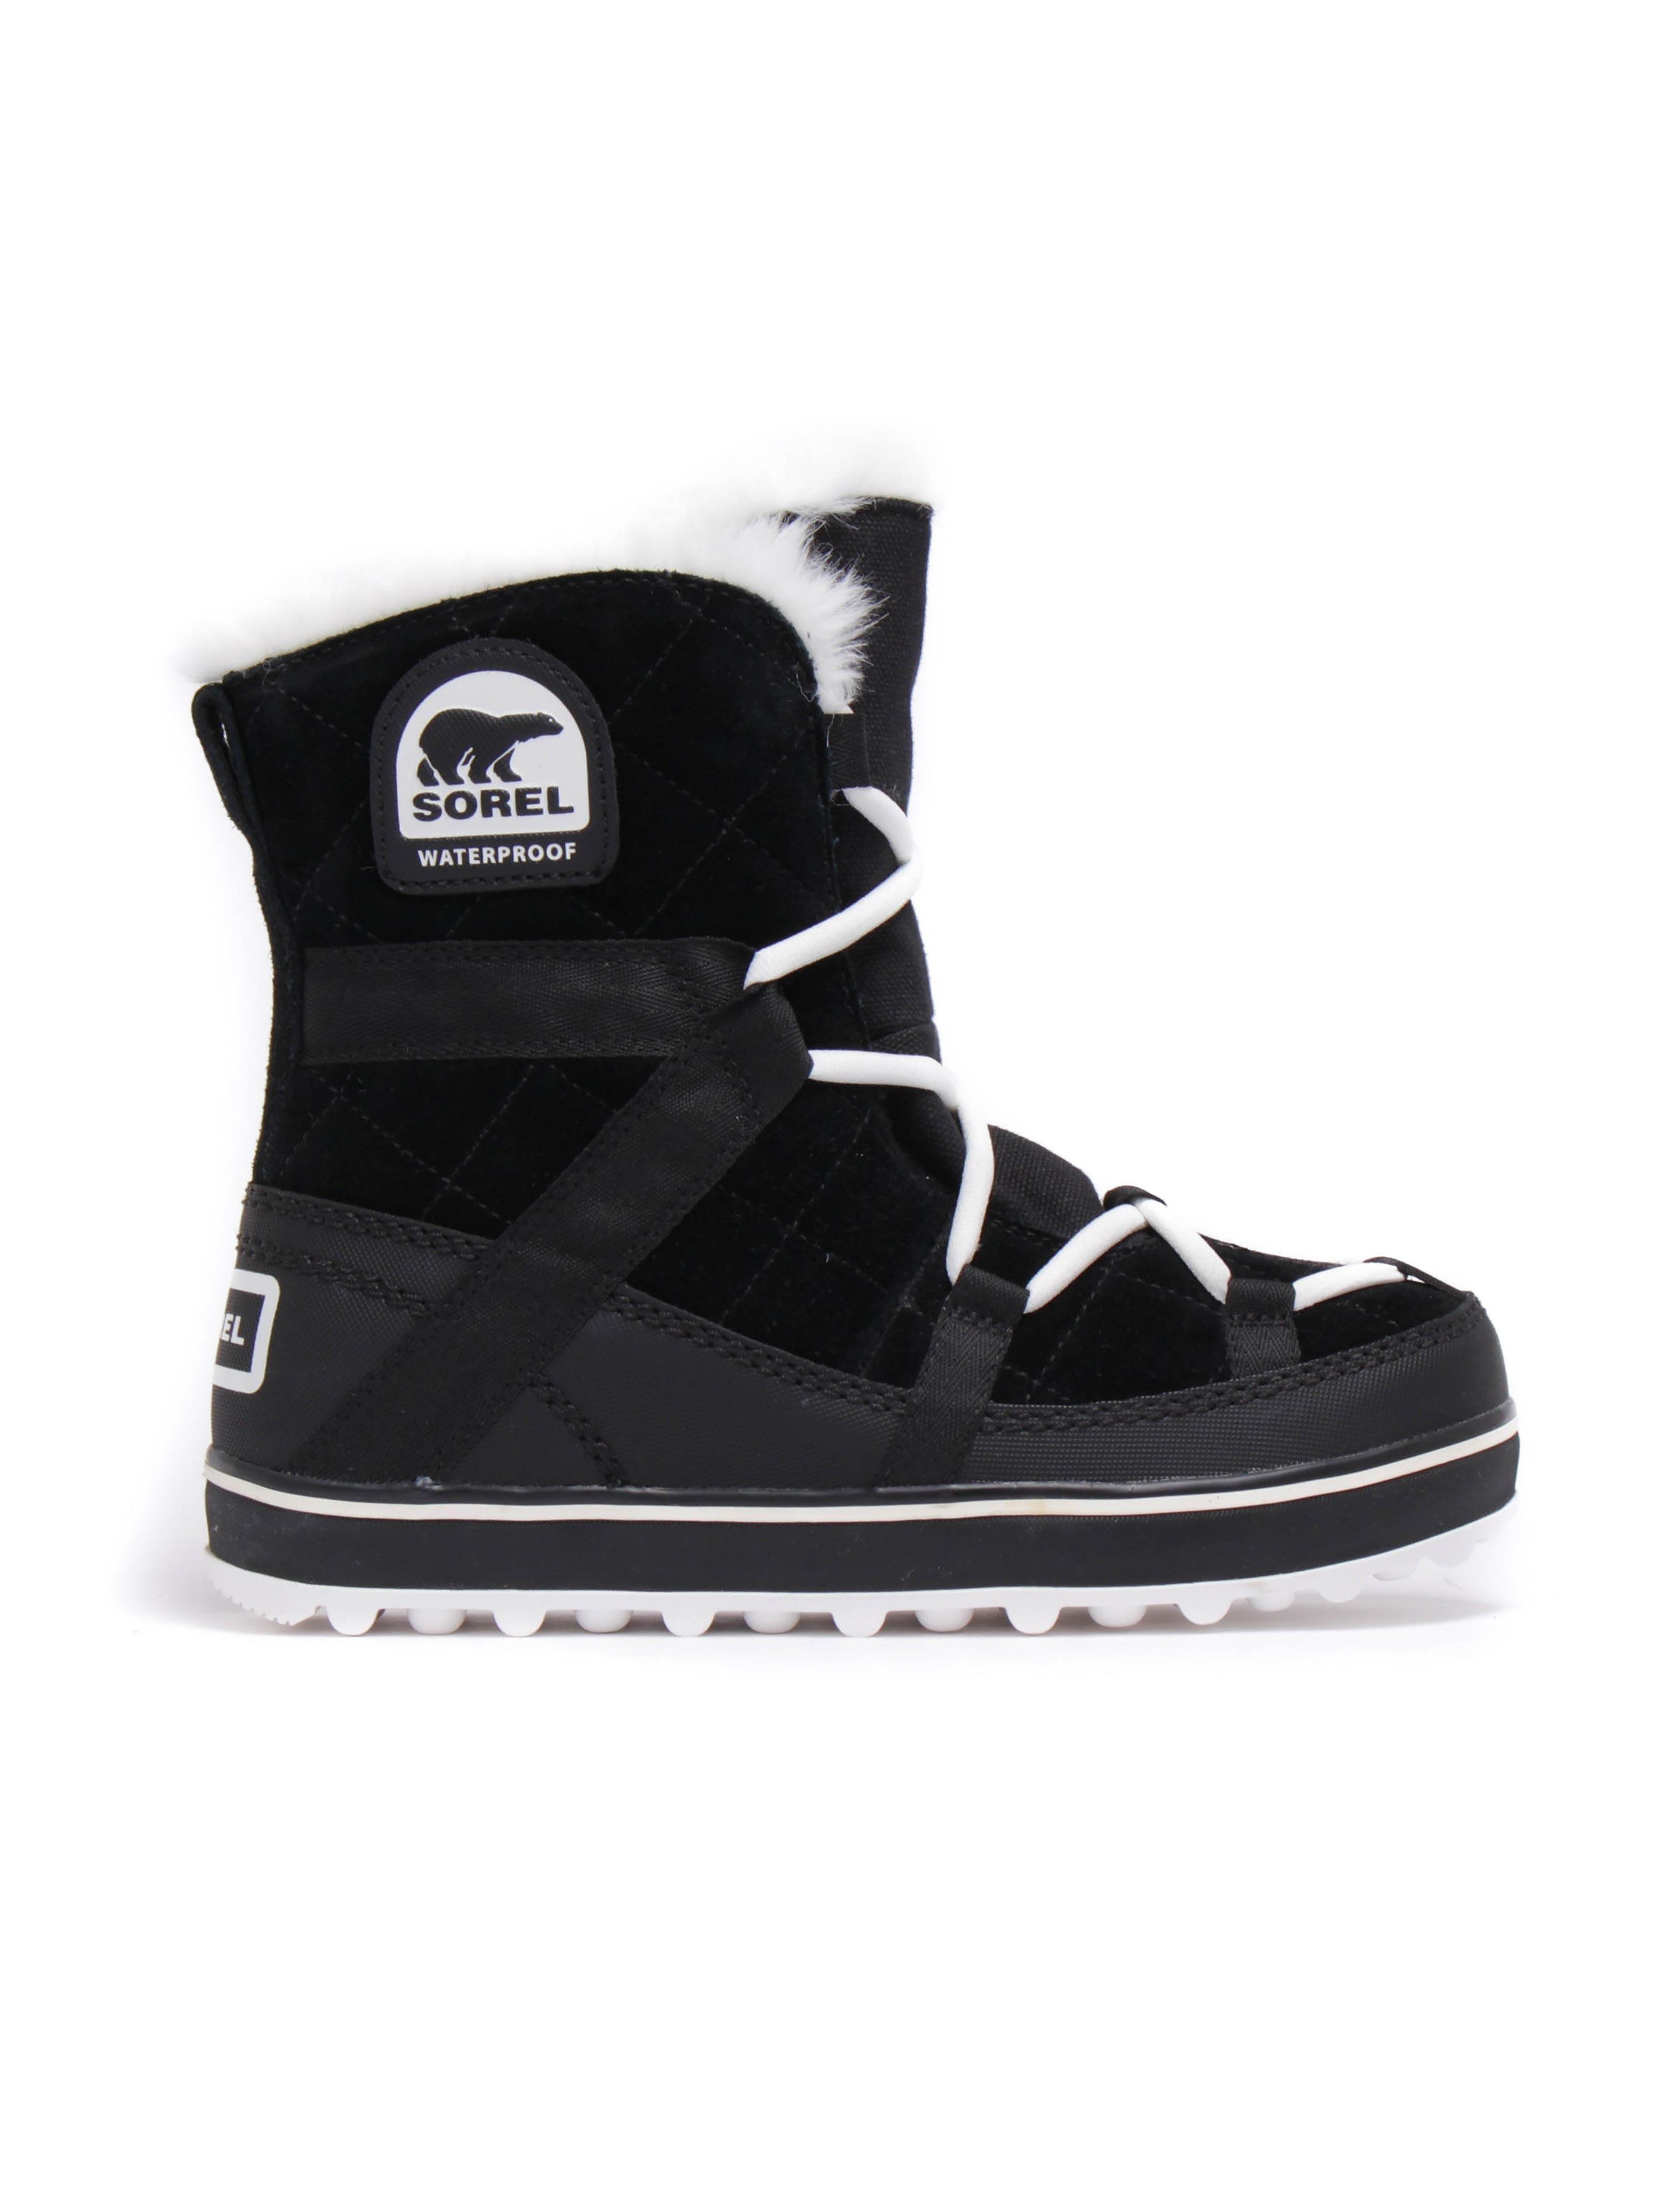 Sorel Women's Glacy Explorer Shortie Boots - Black